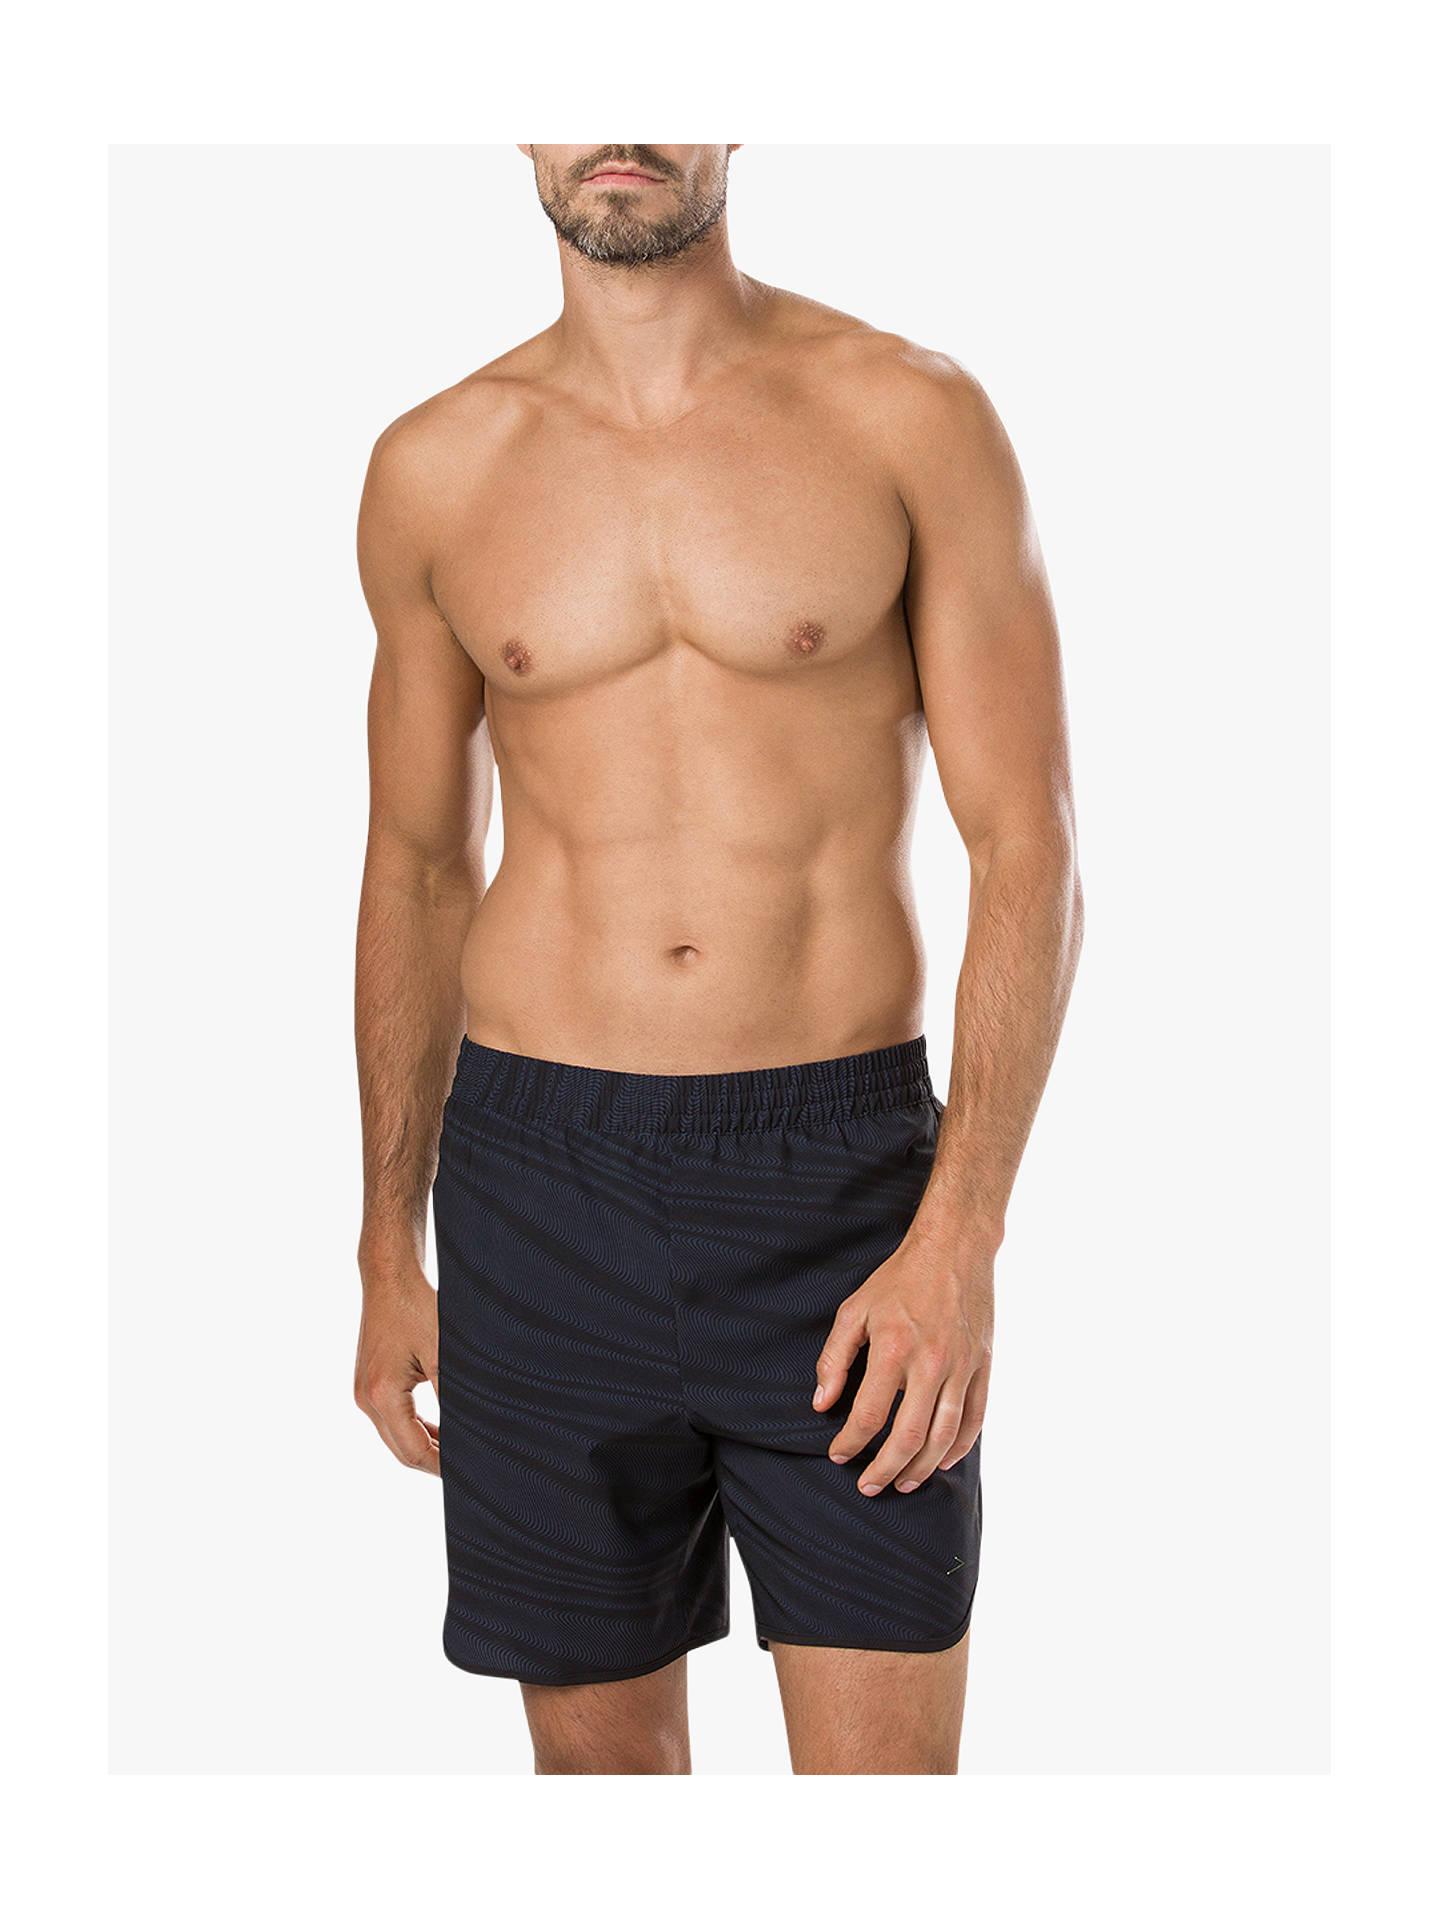 1afacfc981b0d Buy Speedo ReflectWave Trim Swim Shorts, Grey, S Online at johnlewis.com ...